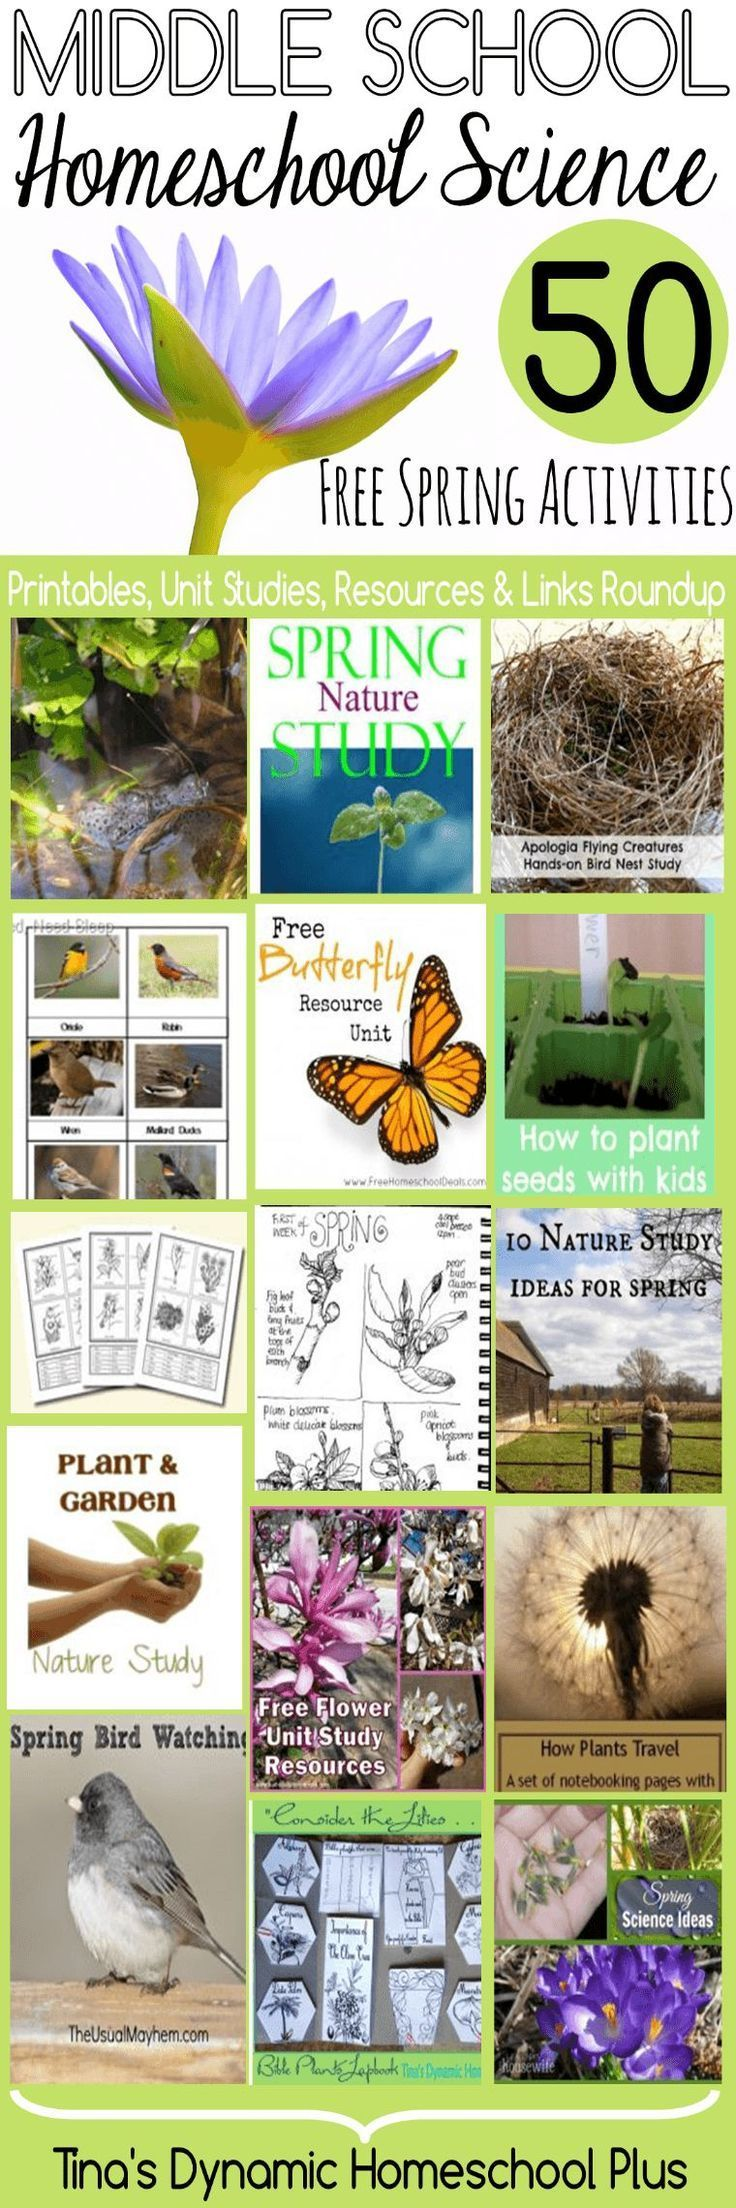 Middle School Homeschool Science 50 Free Spring Activities   Tina's Dynamic Homeschool Plus